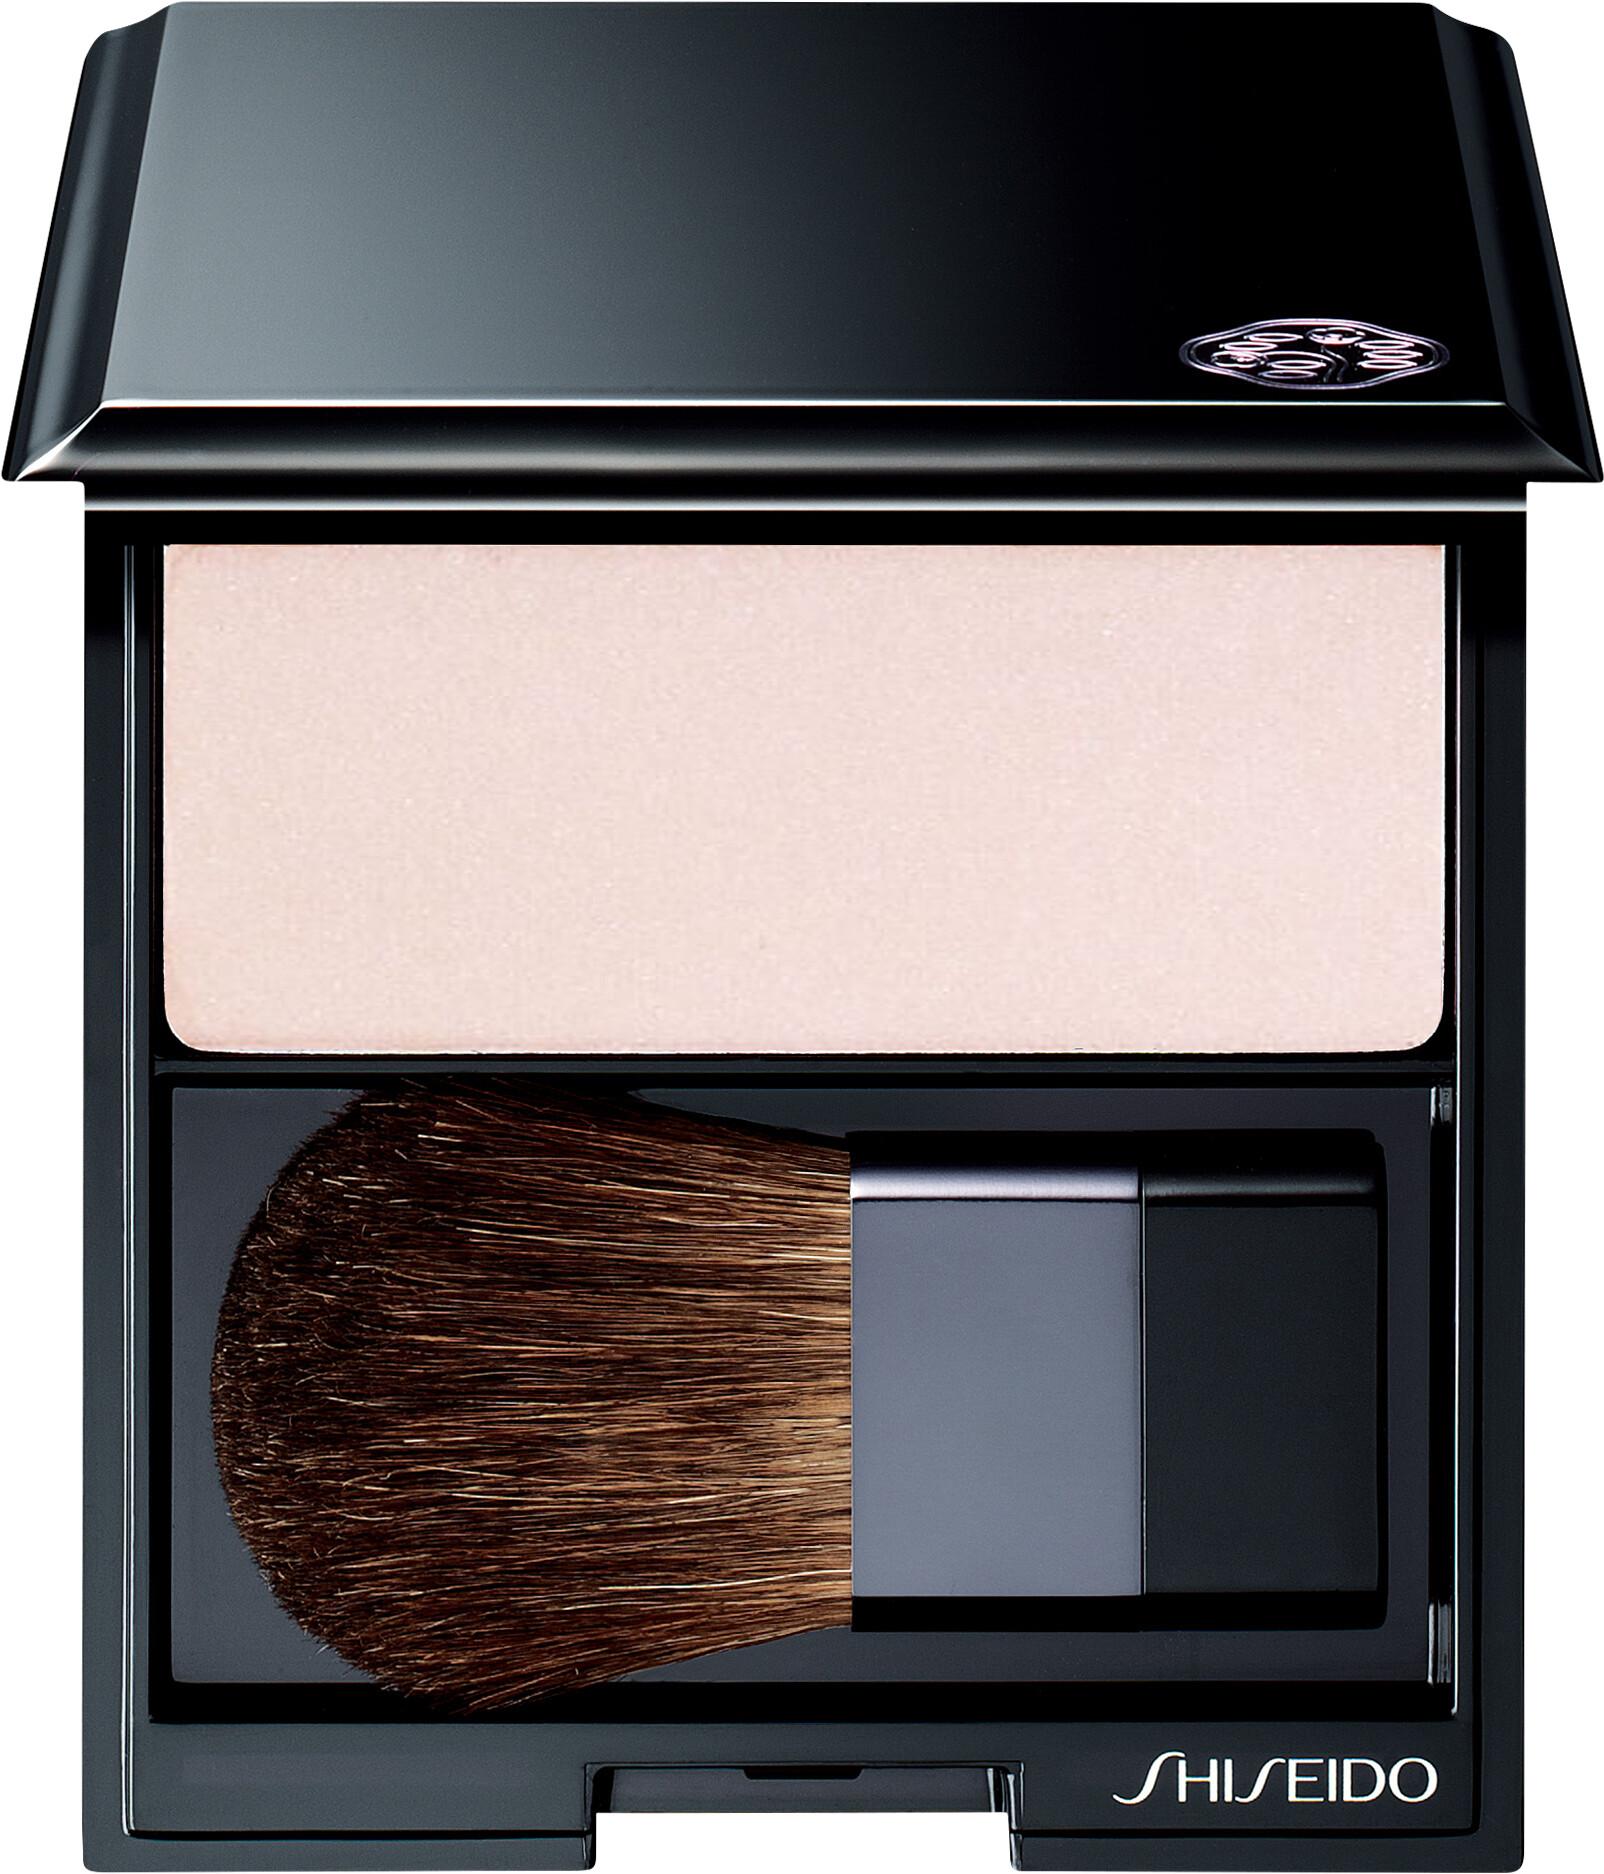 Shiseido Luminizing Satin Face Color 6 5g